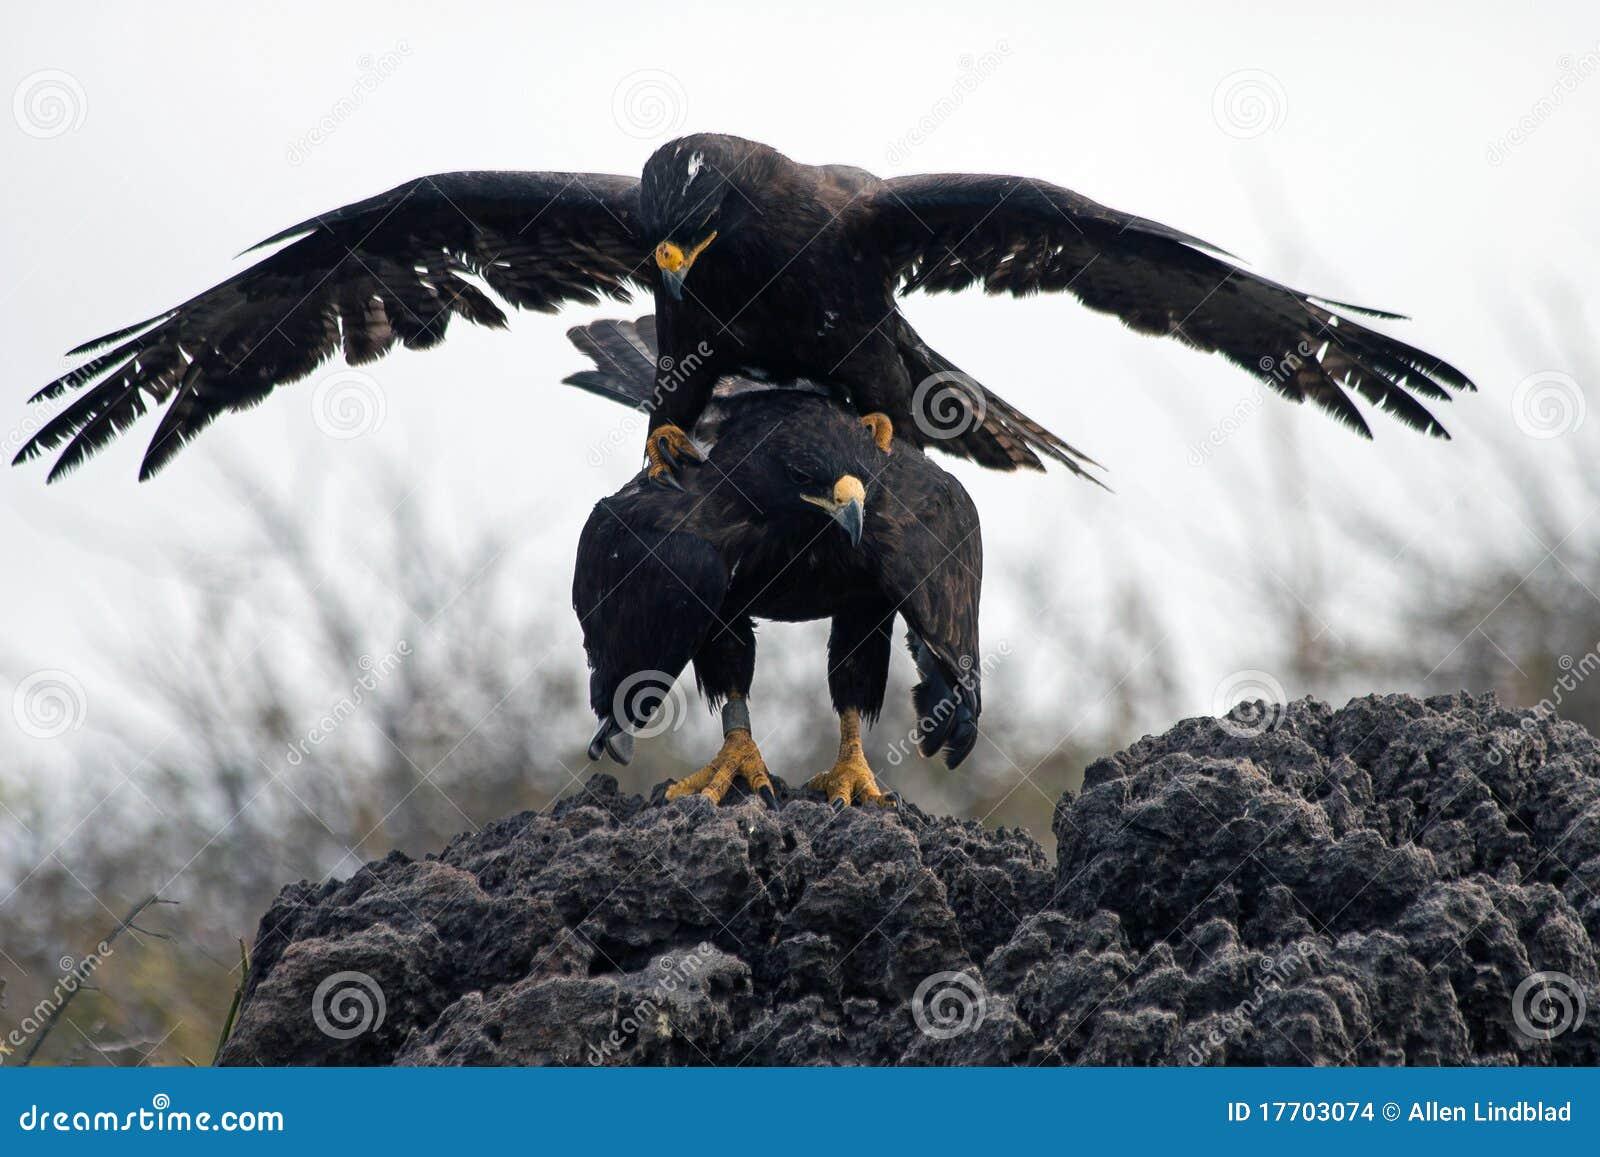 Mating Galapagos Hawks Stock Photo Image Of Couple, Birds - 17703074-8908